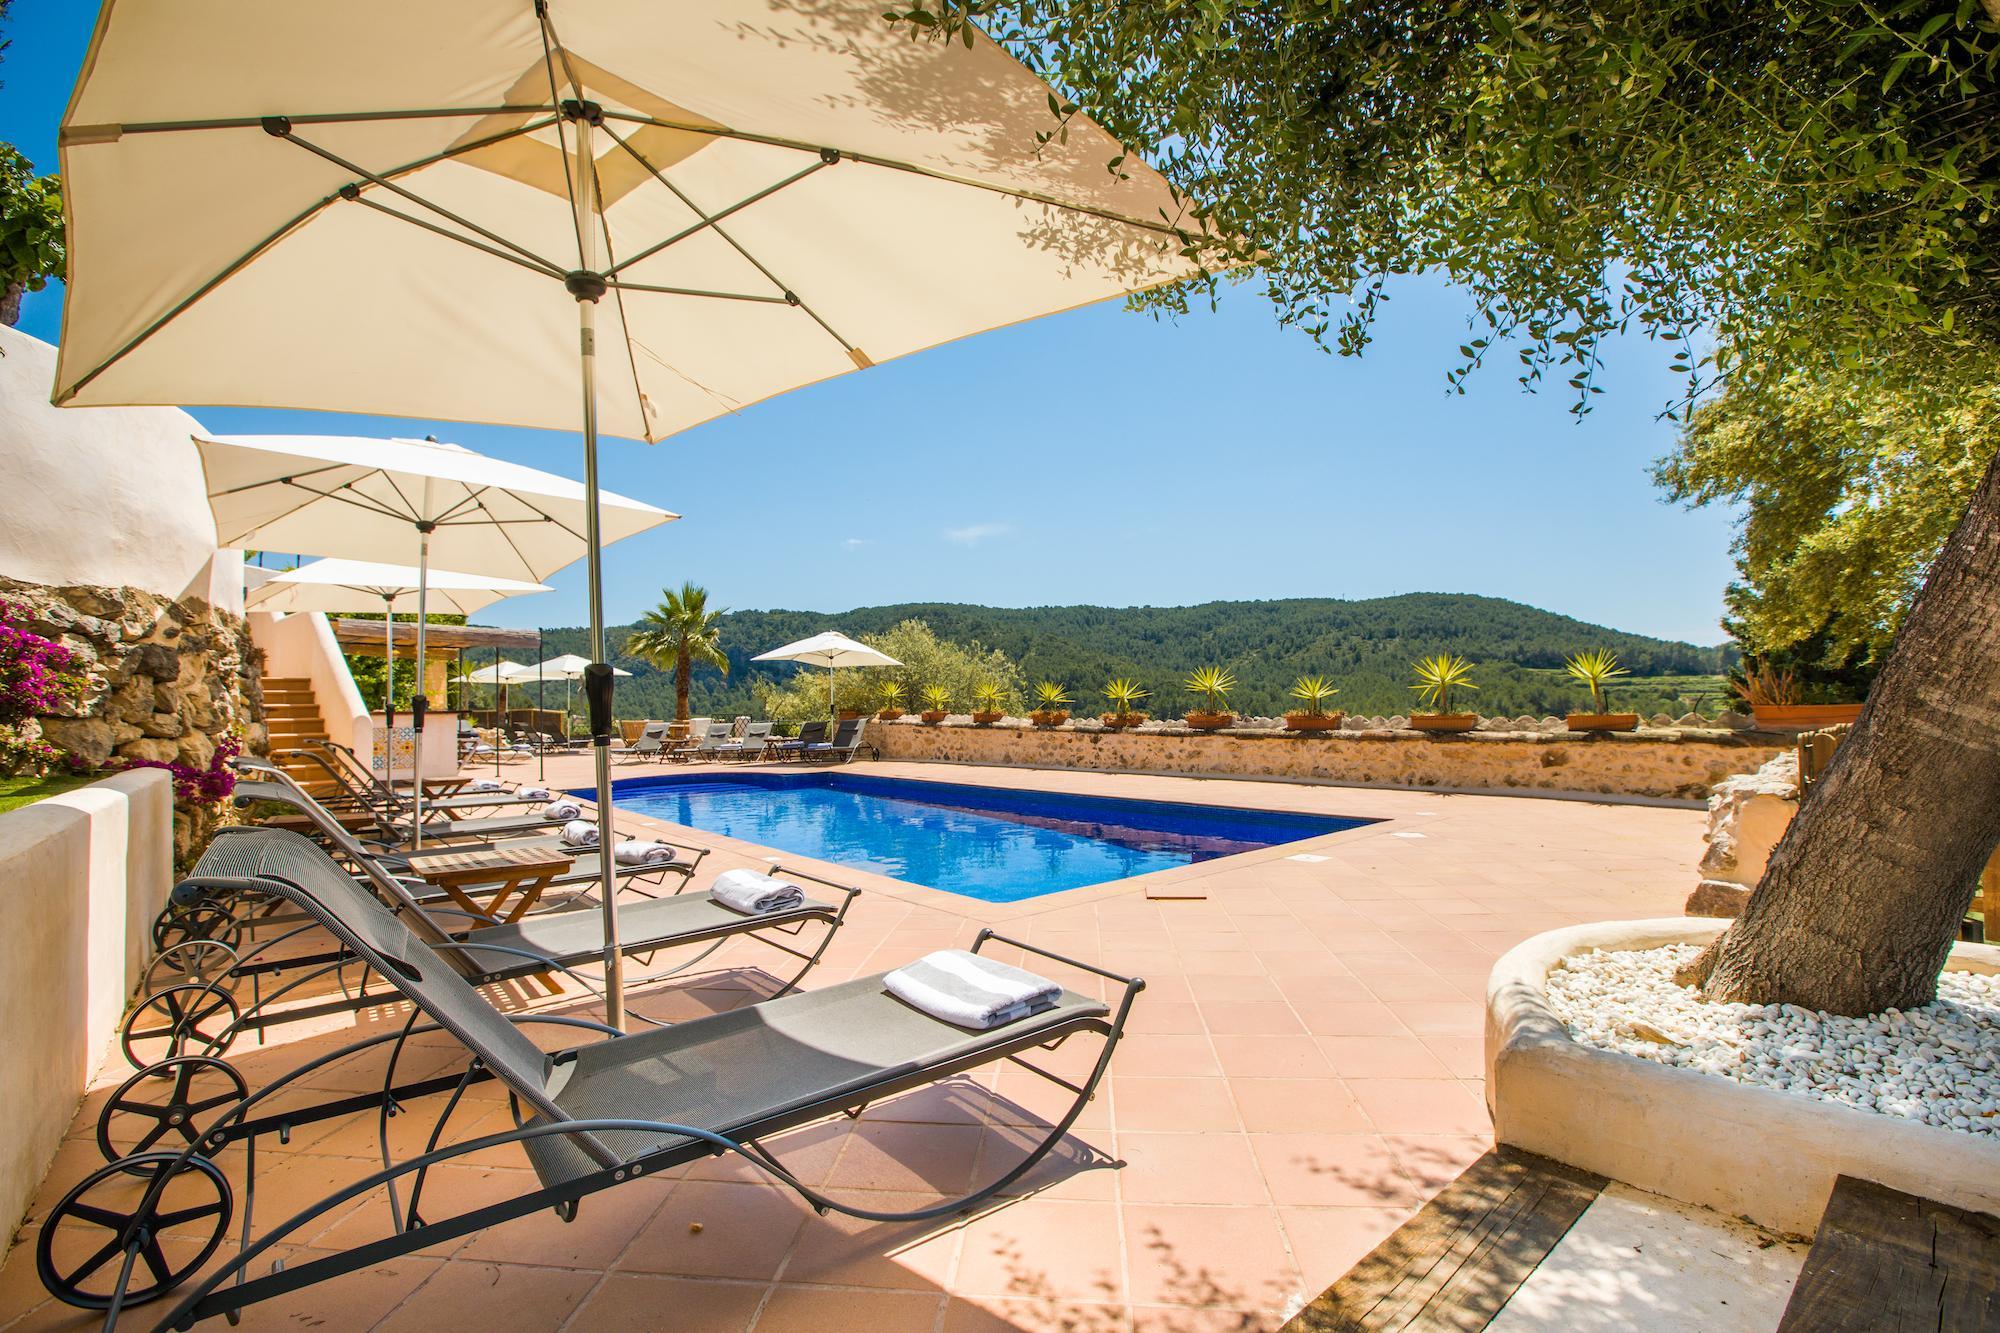 Large Barcelona Villa swimming pool